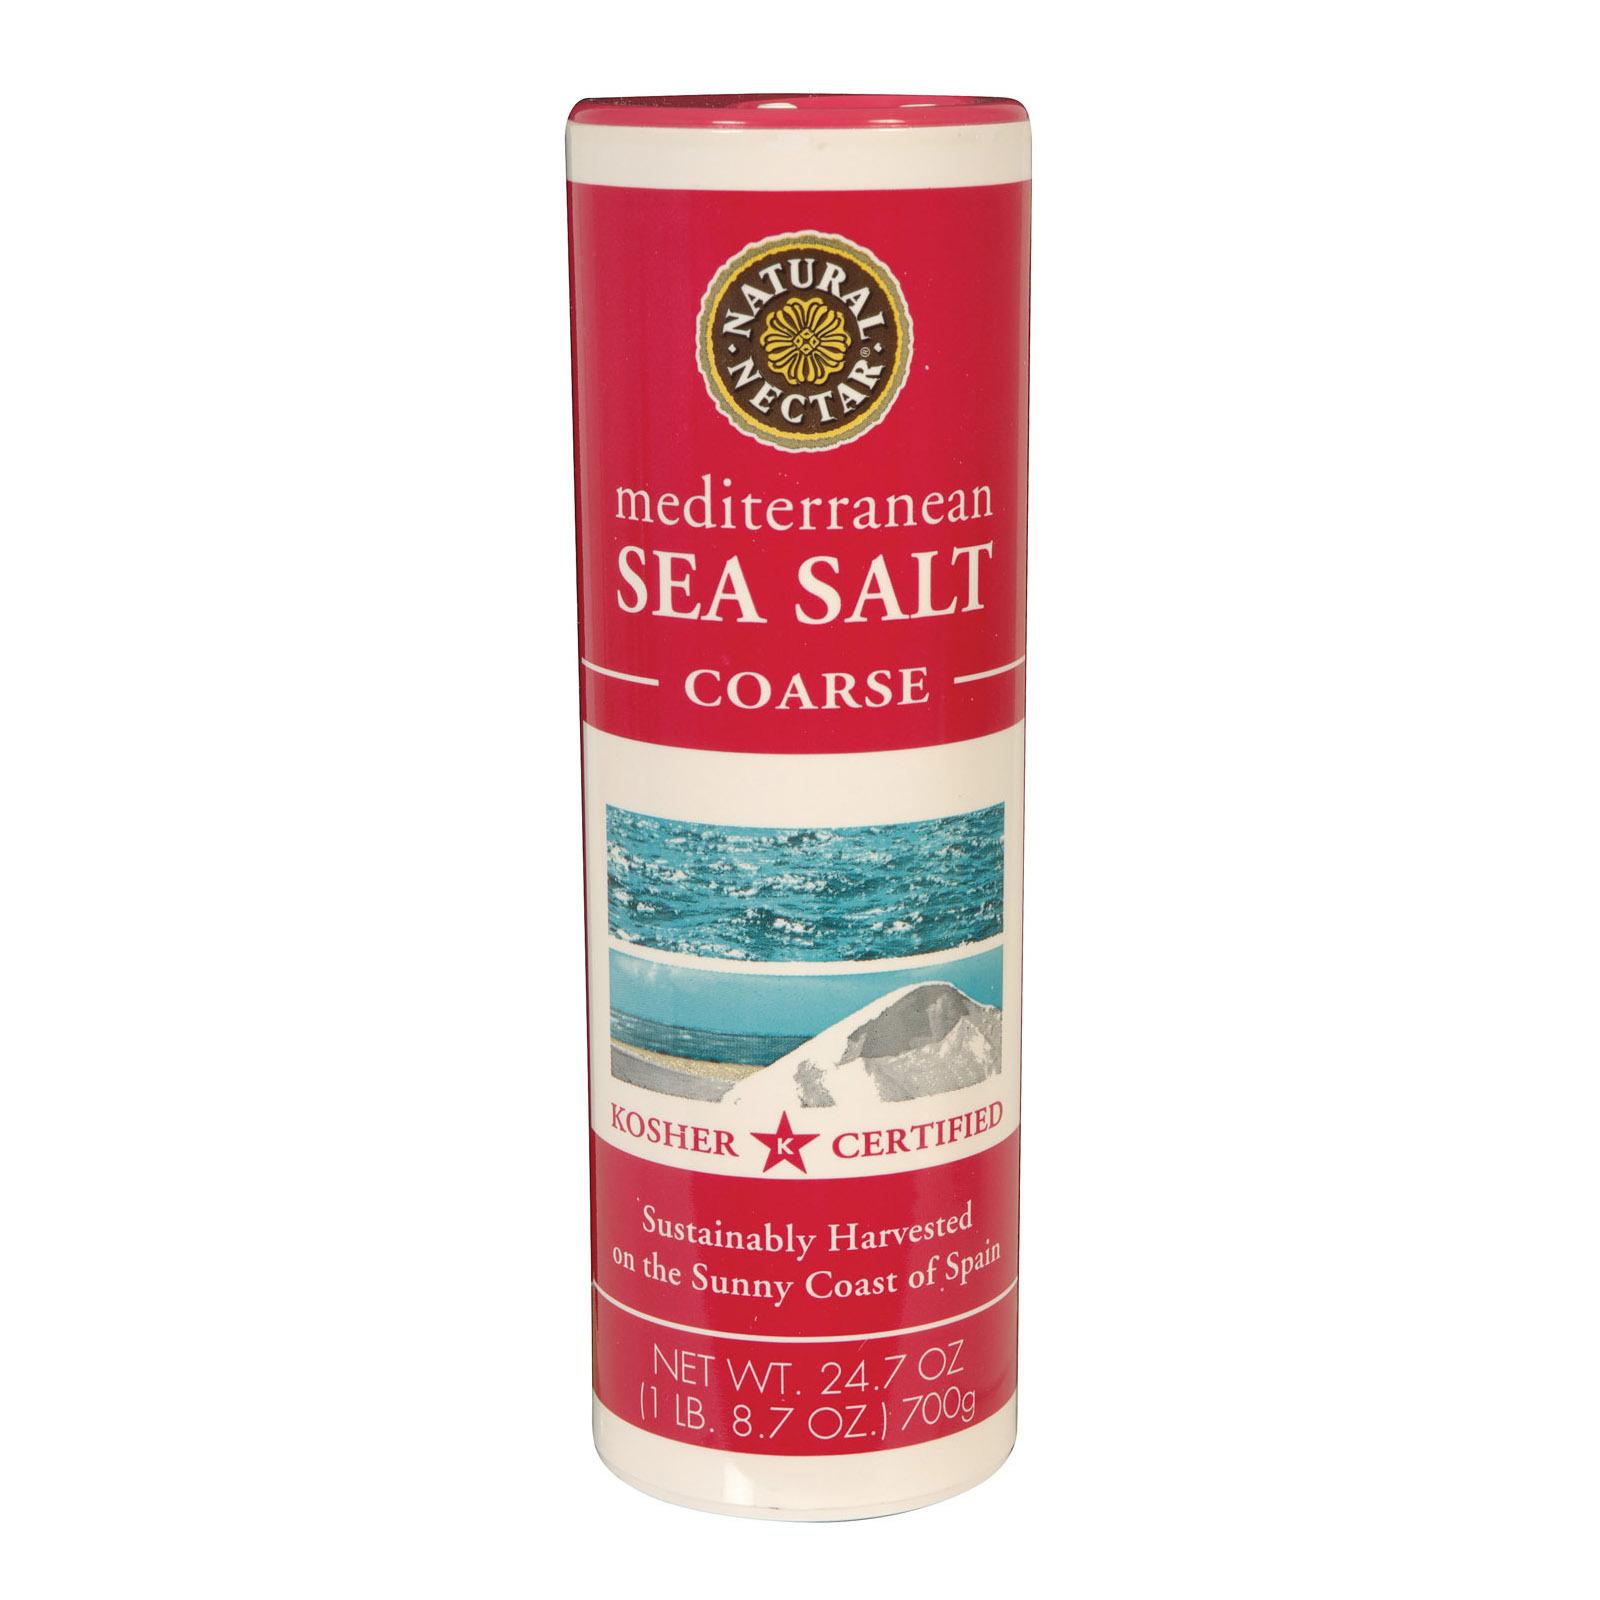 Natural Nectar Coarse Mediterranean - Sea Salt - Case of 12 - 24.7 oz.